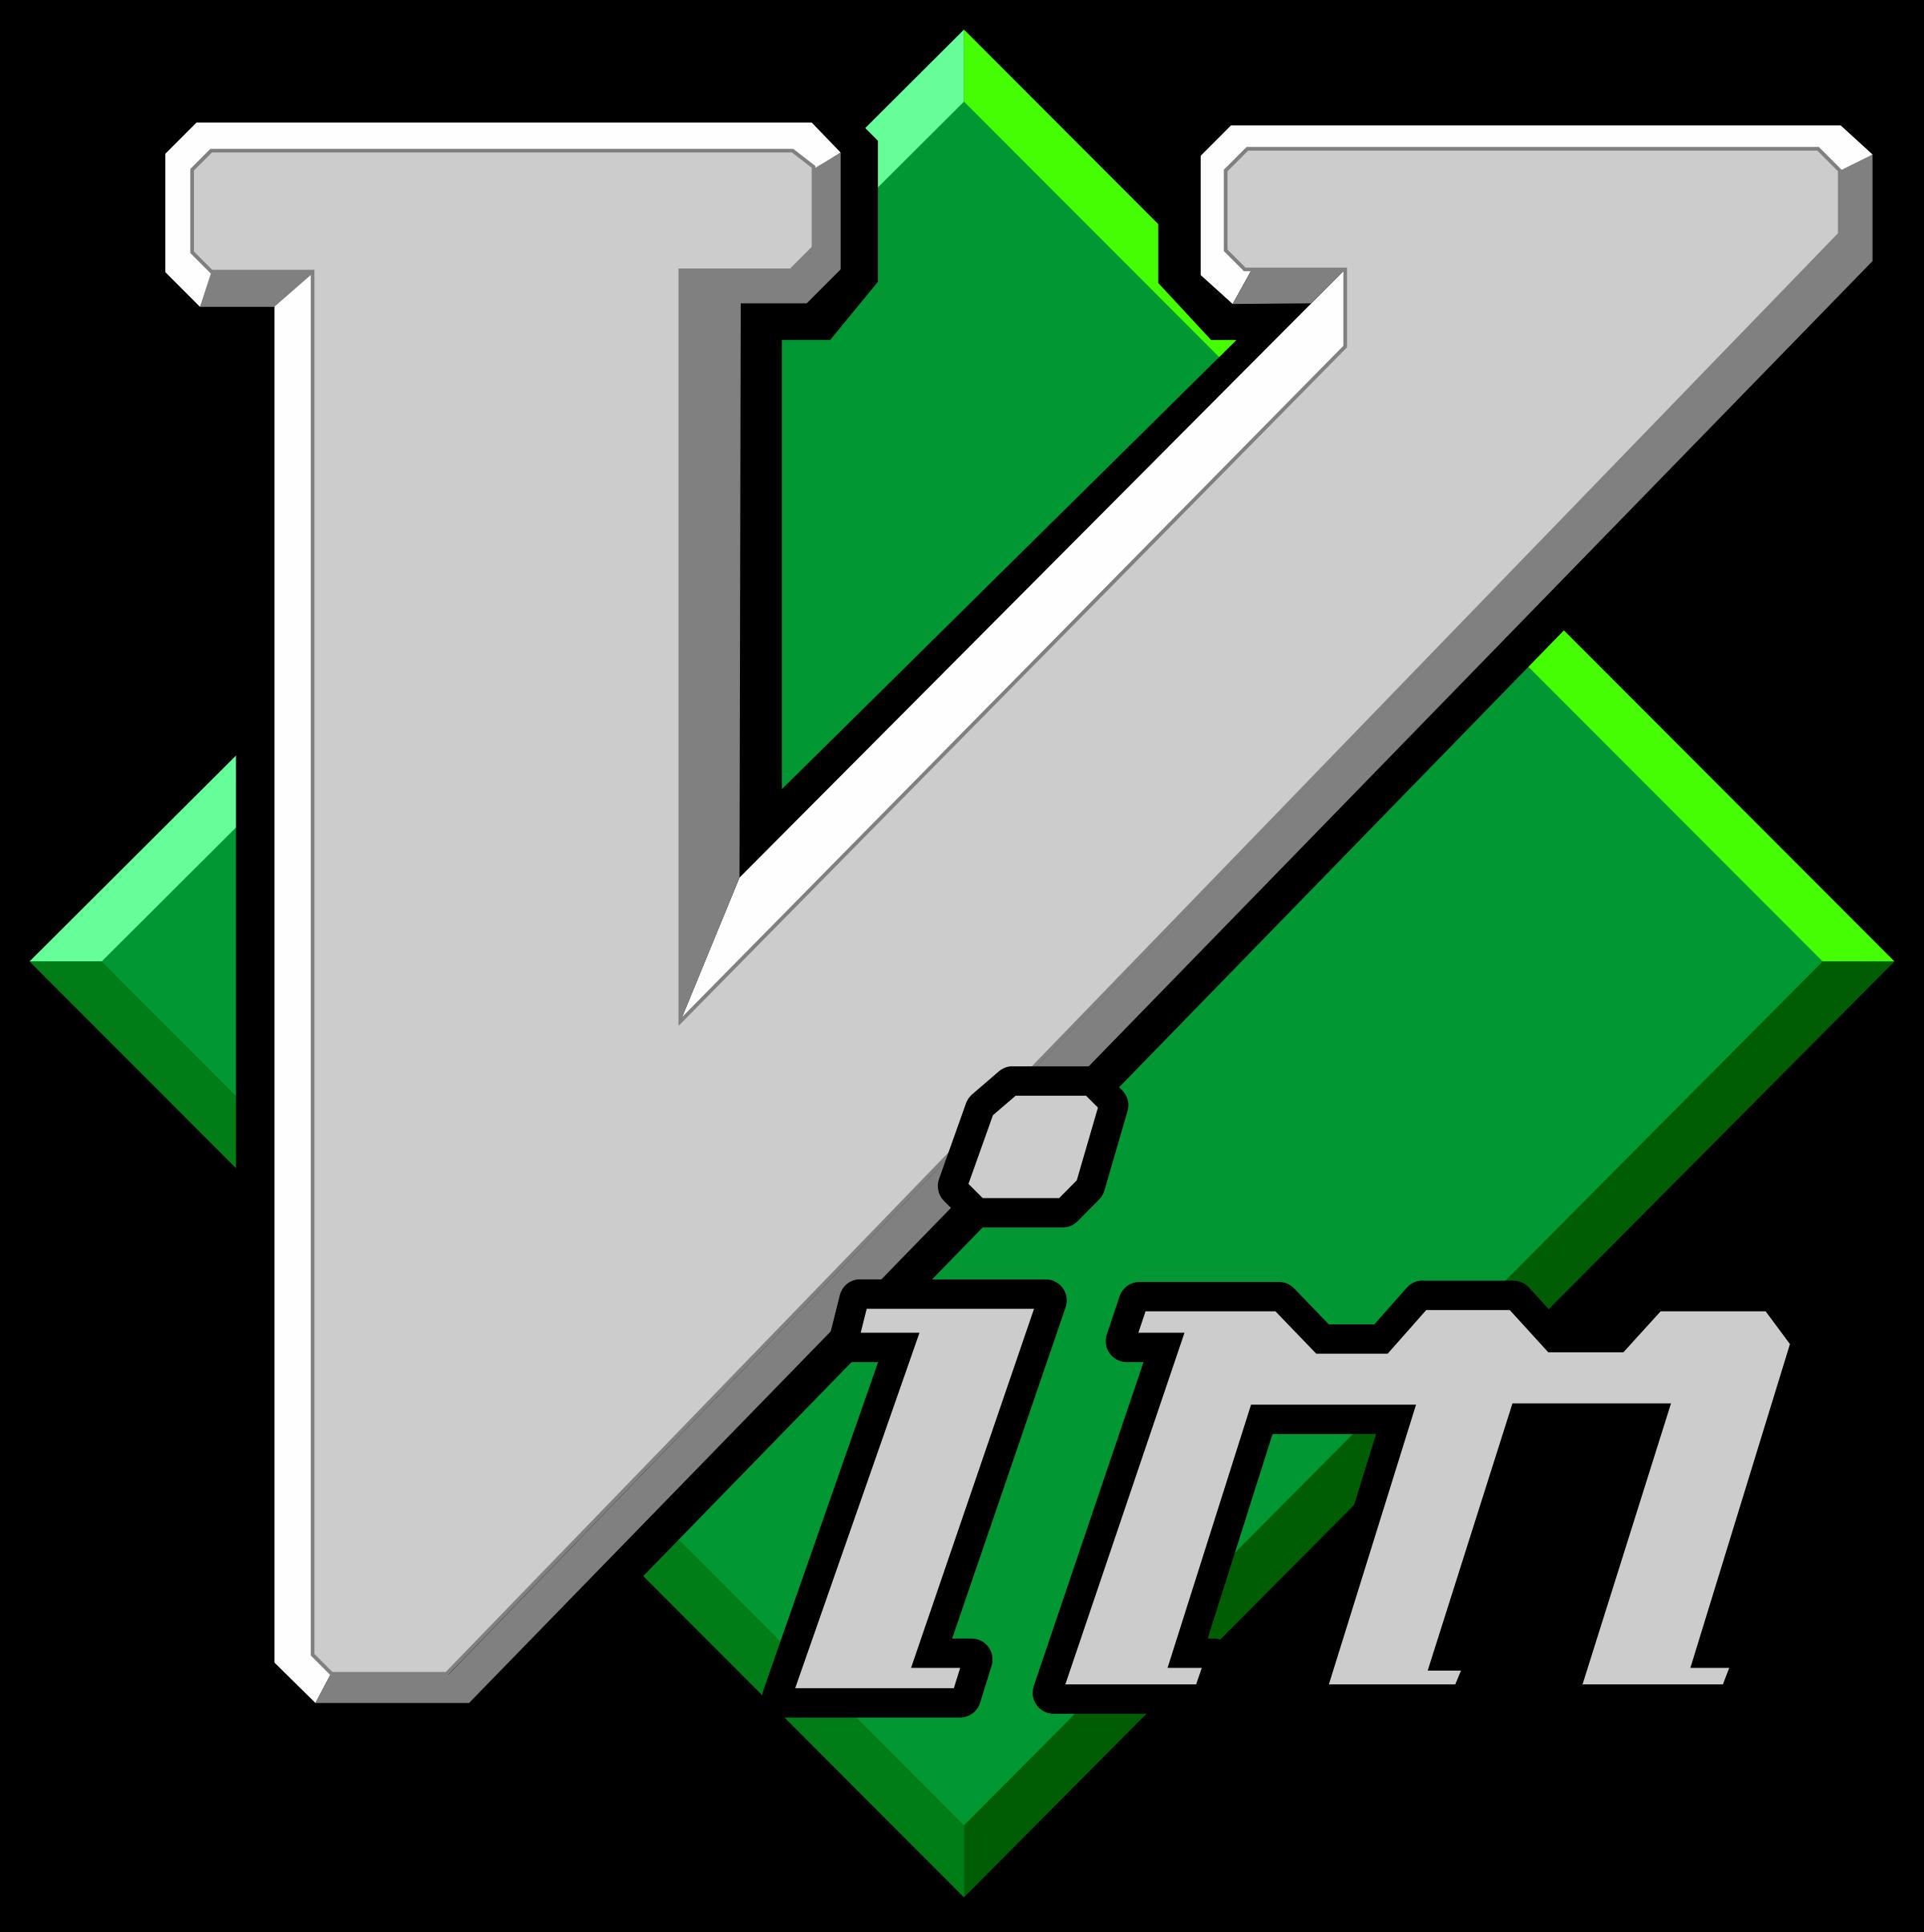 vim-logo-png-transparent.png